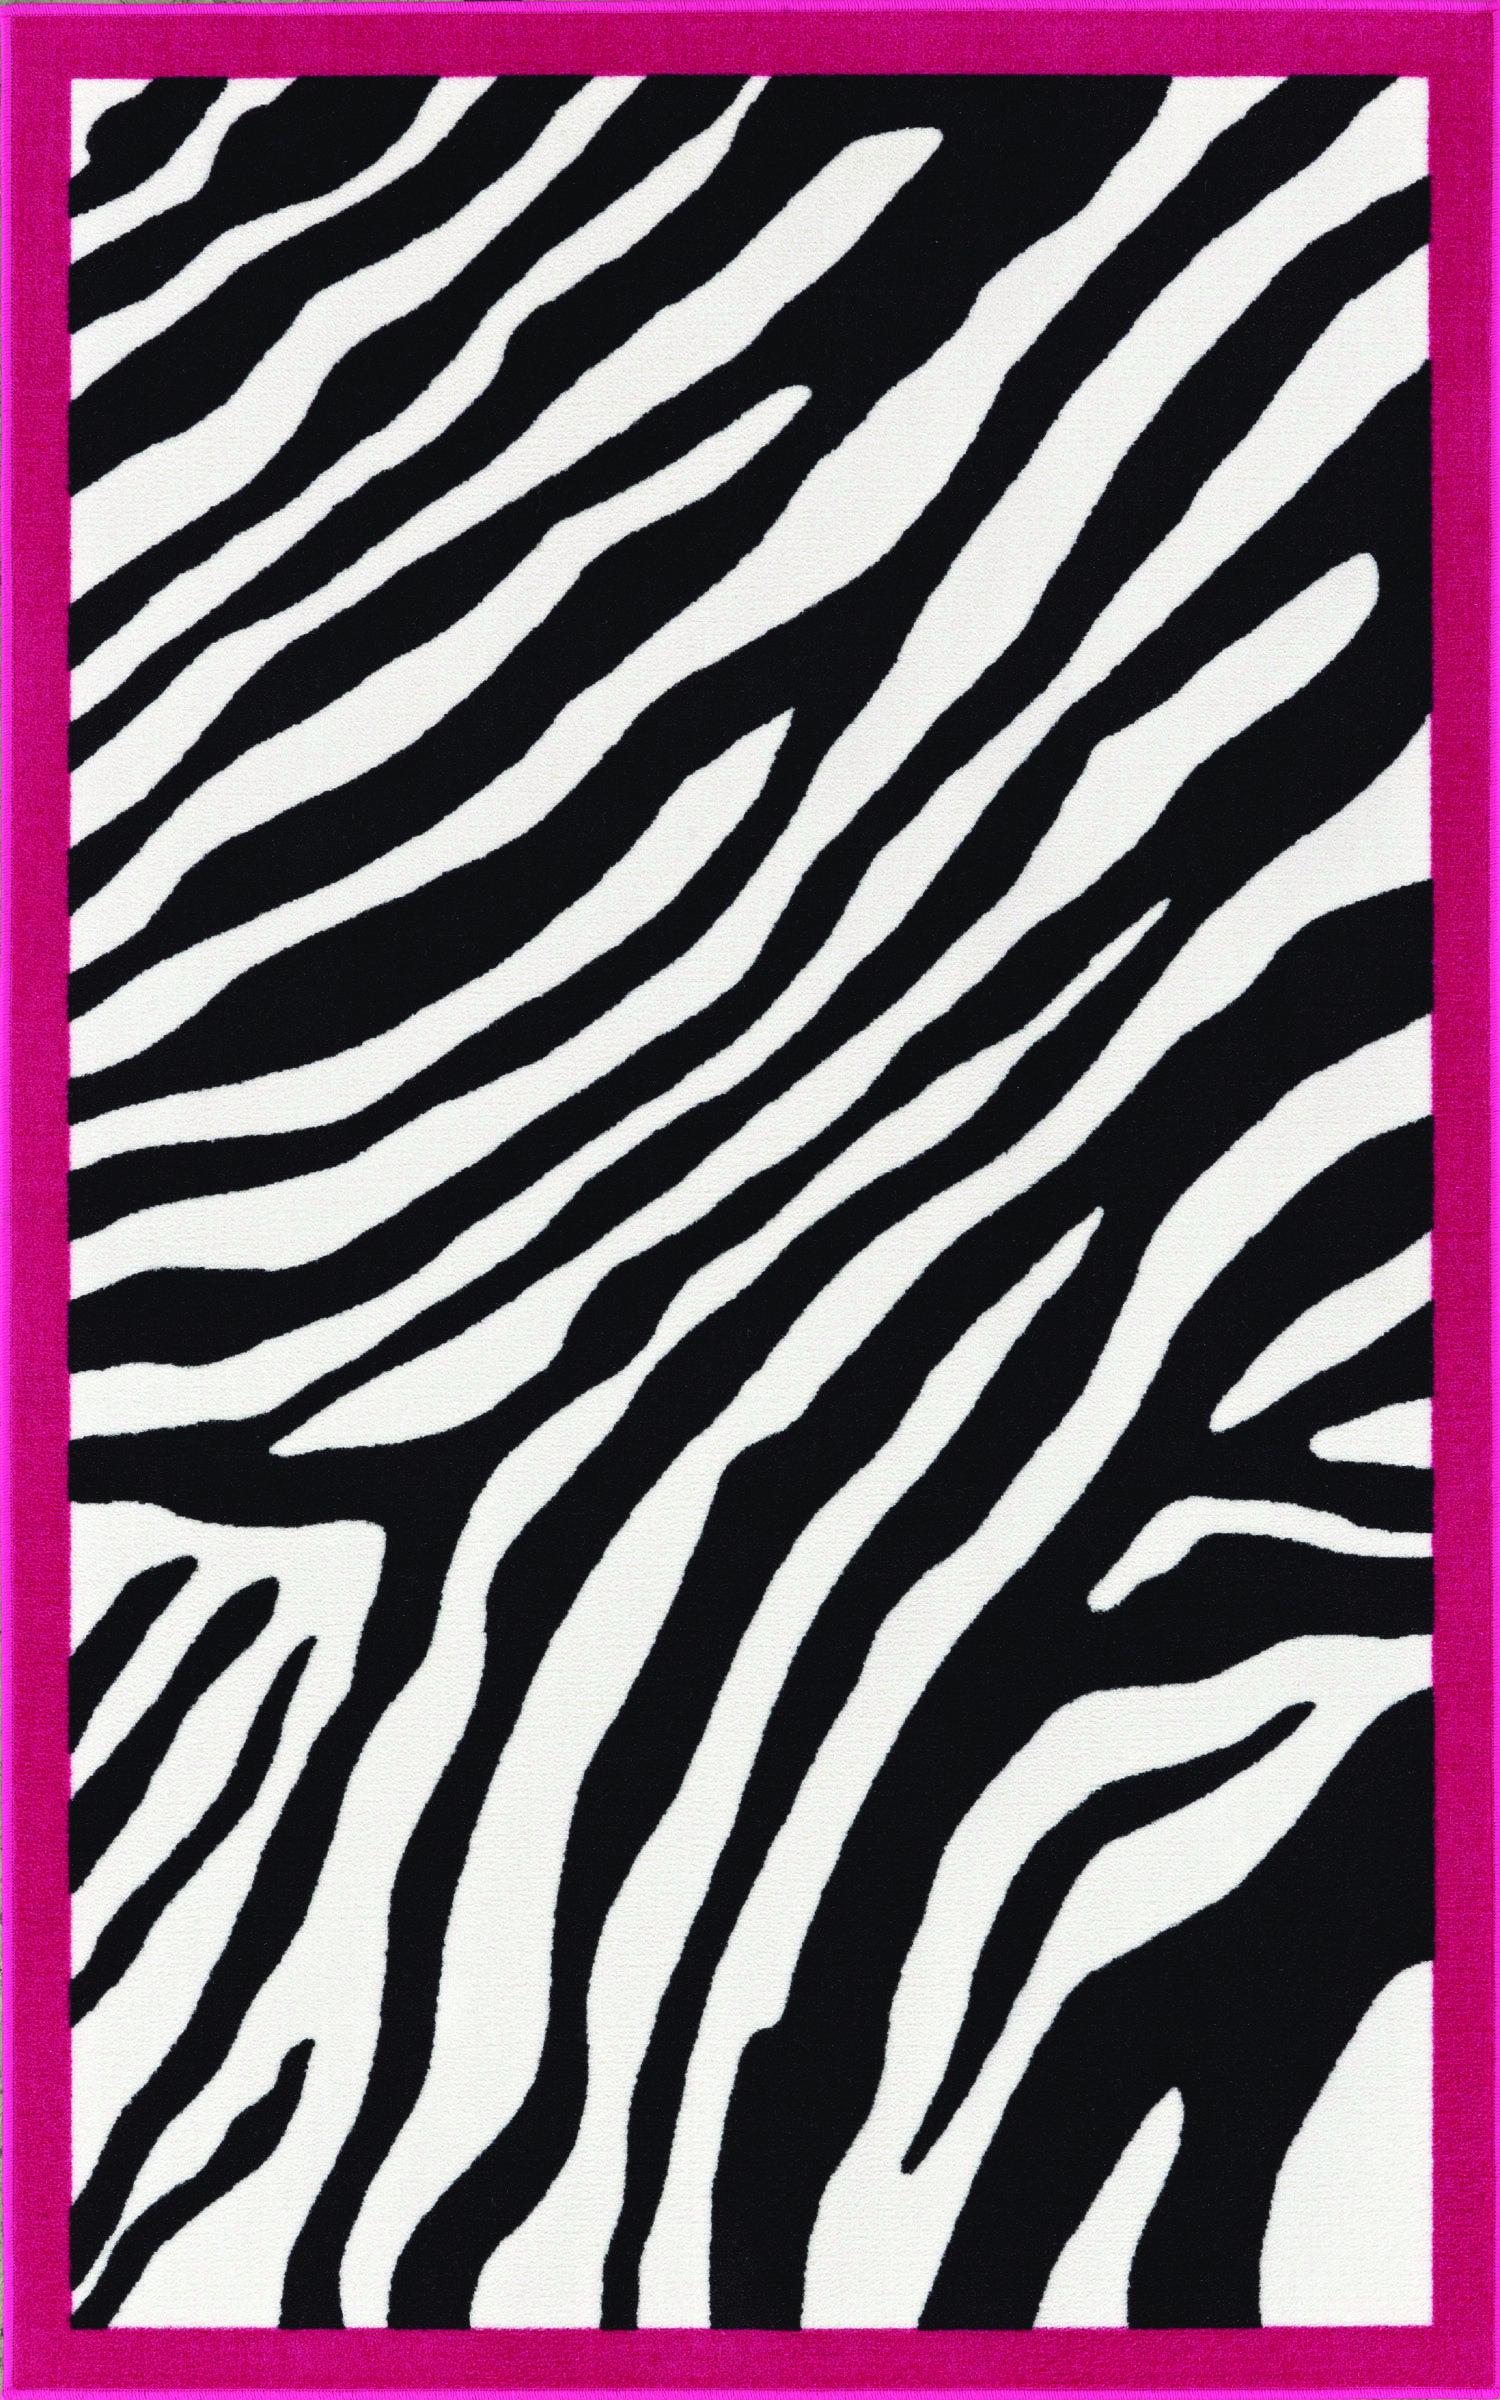 Home Accents Accessories Jerome S Furniture Zebra Print Rug Zebra Area Rug Kids Area Rugs